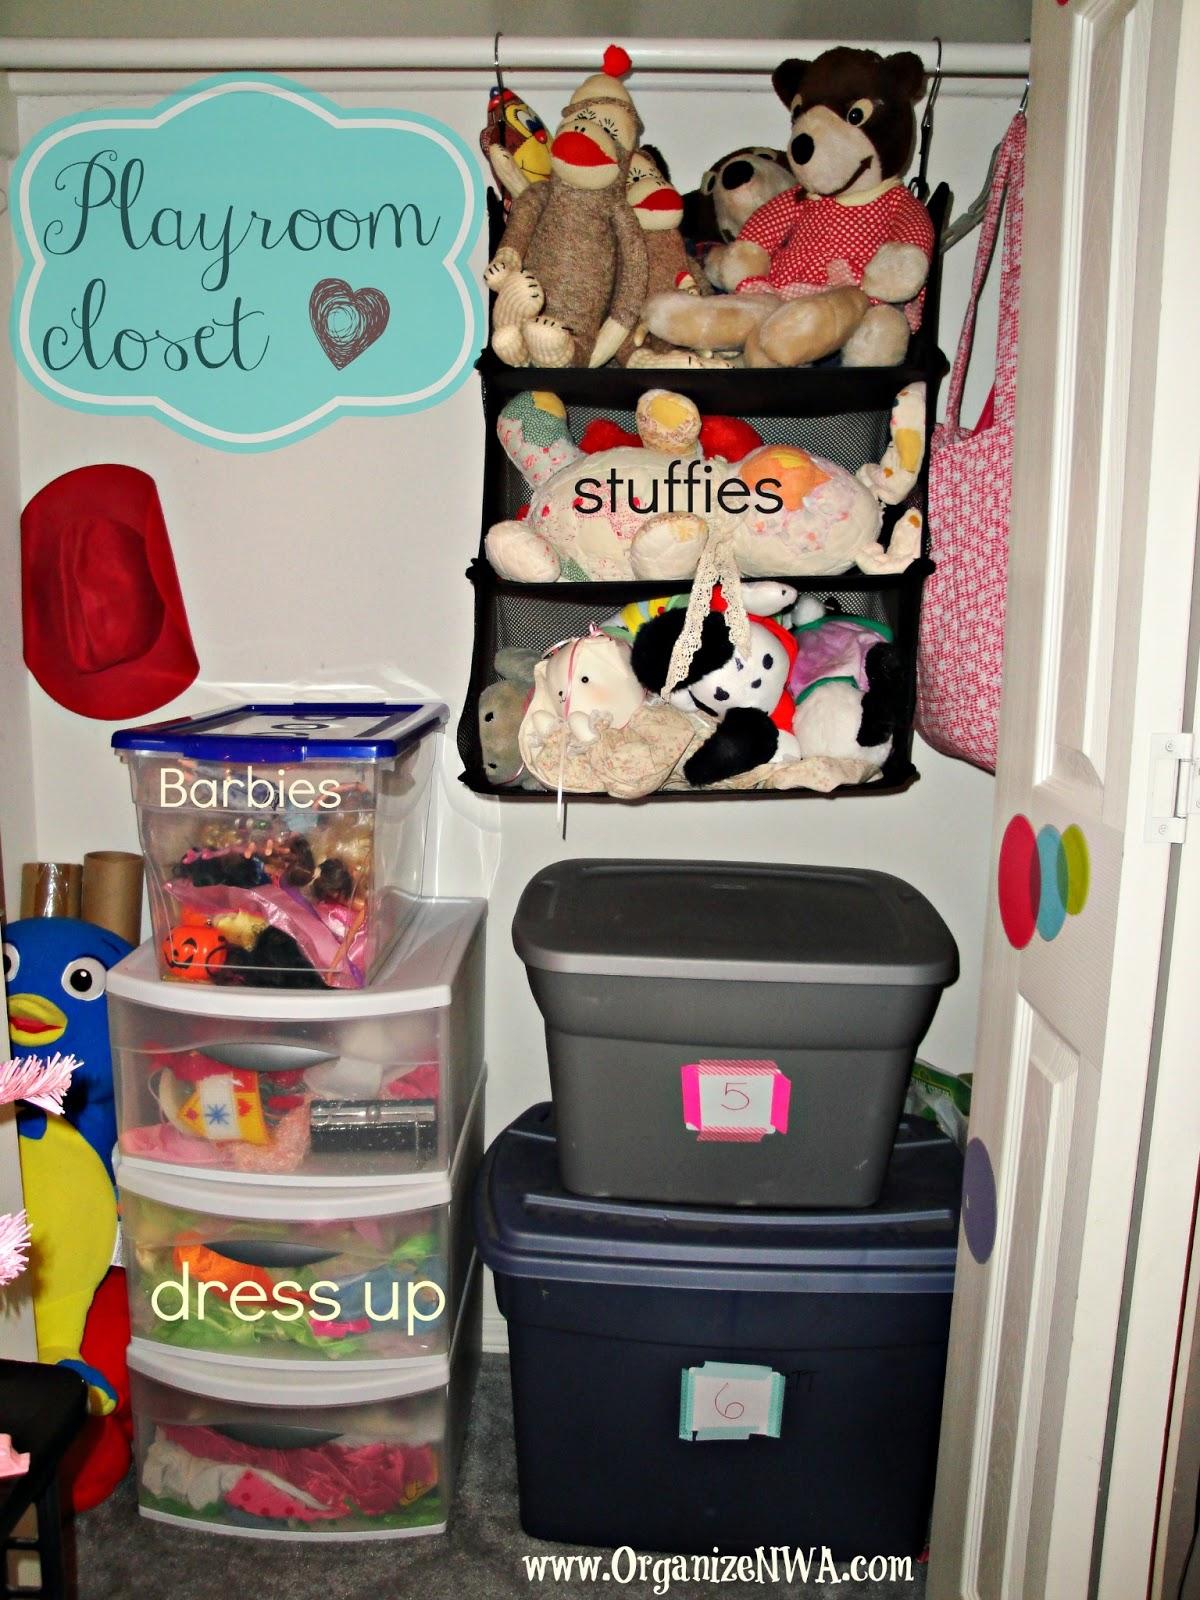 The Playroom Closet